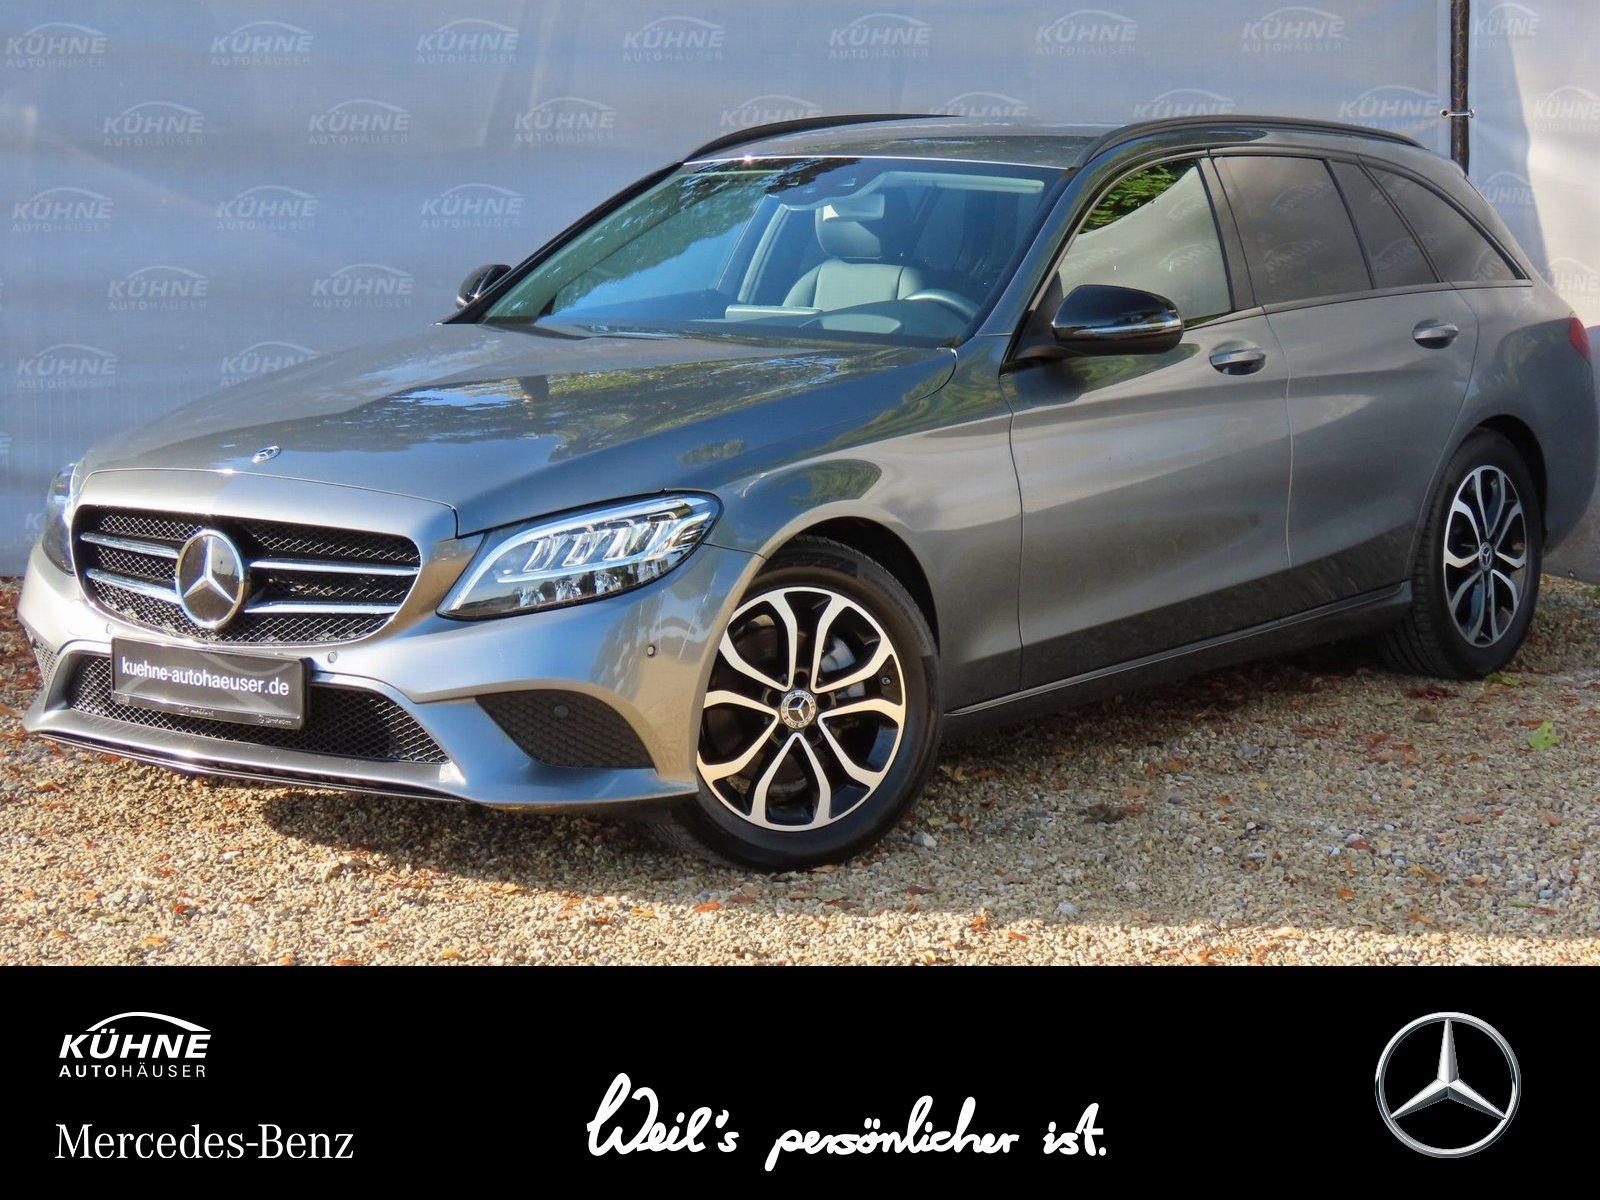 Mercedes-Benz C 220d T Distronic+Comand+Kamera+LED+Night-Paket, Jahr 2019, Diesel